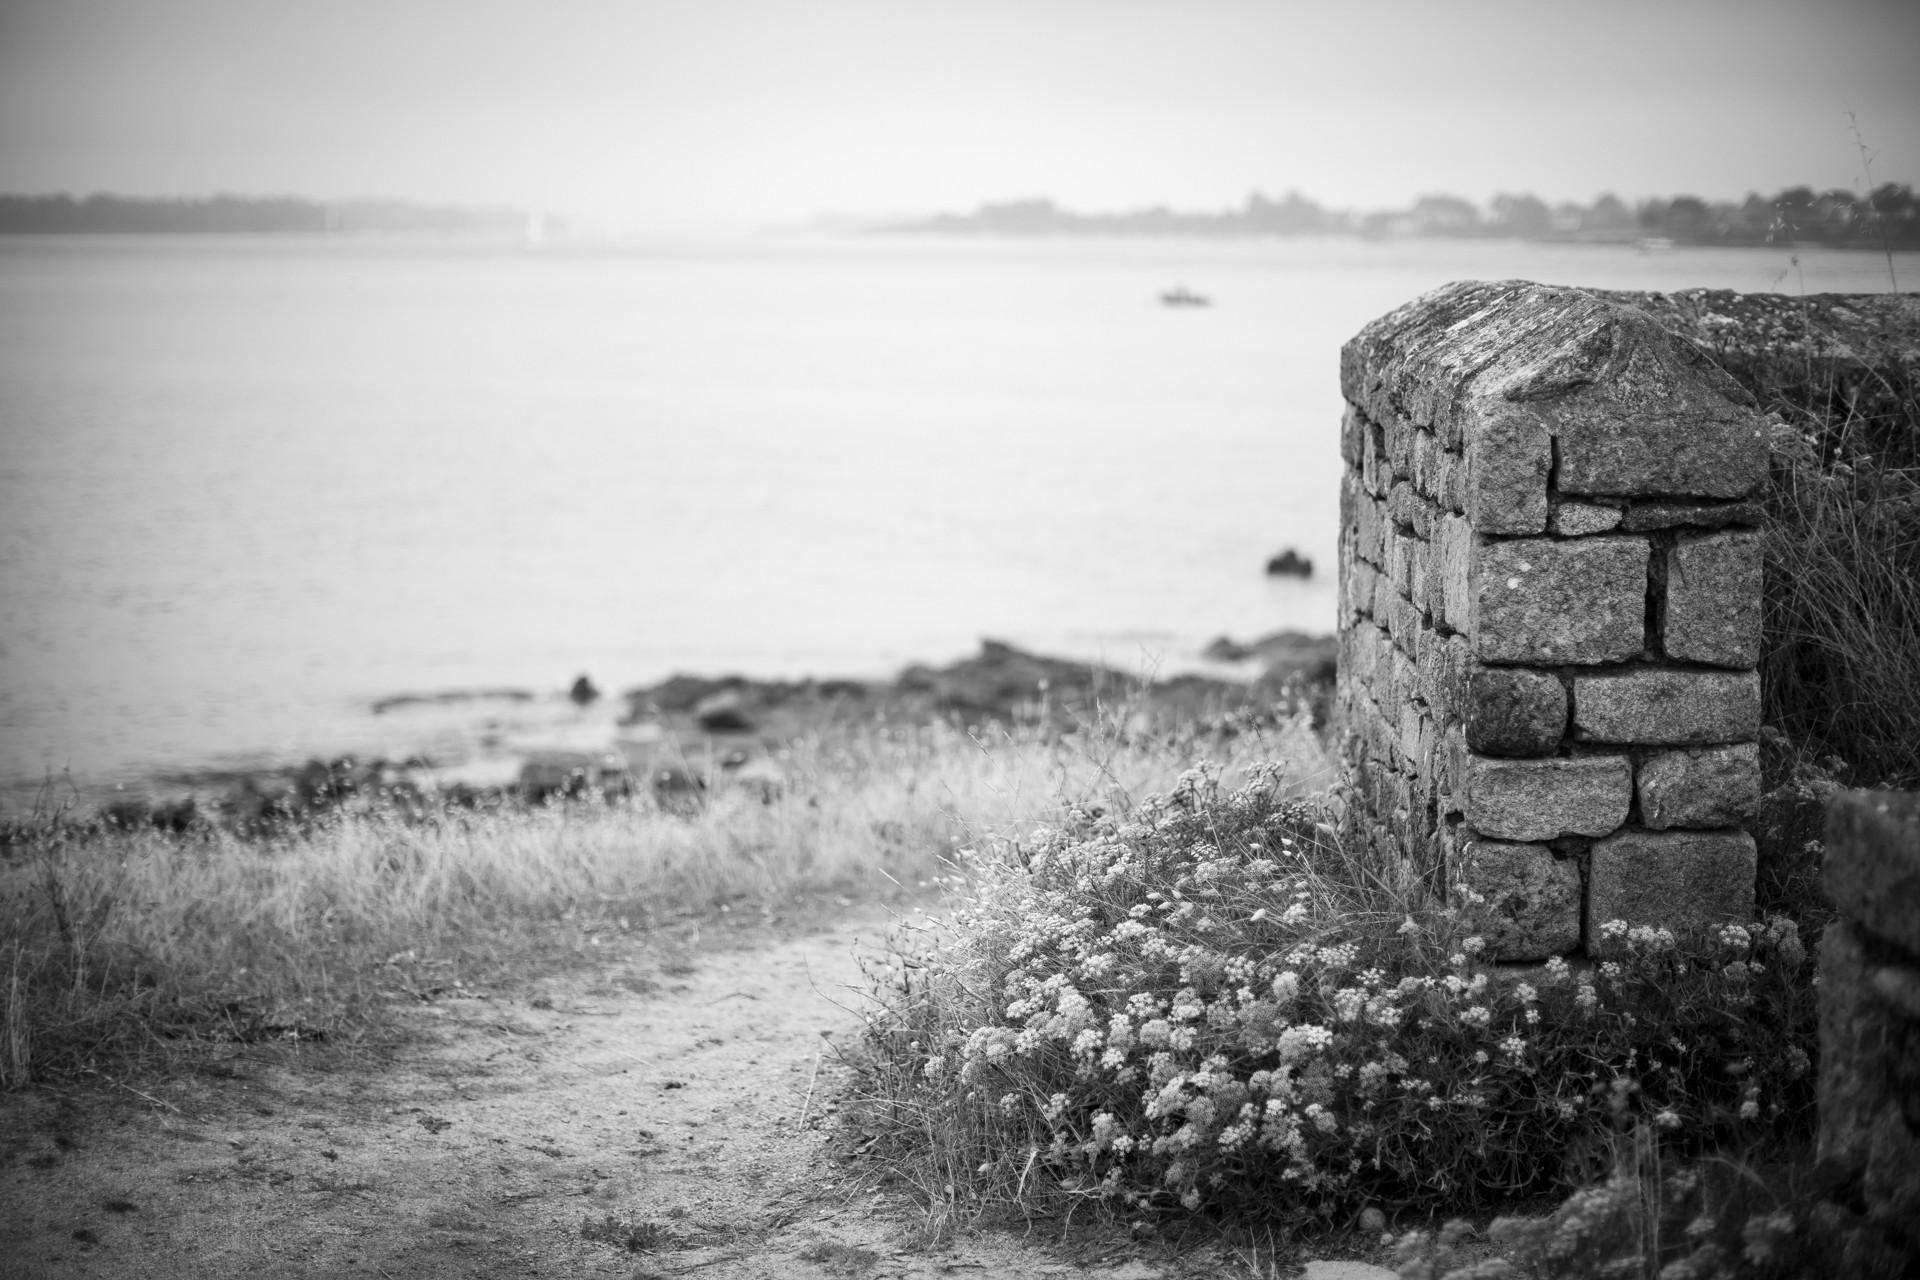 Chemin et muret - Morbihan - Août 2020